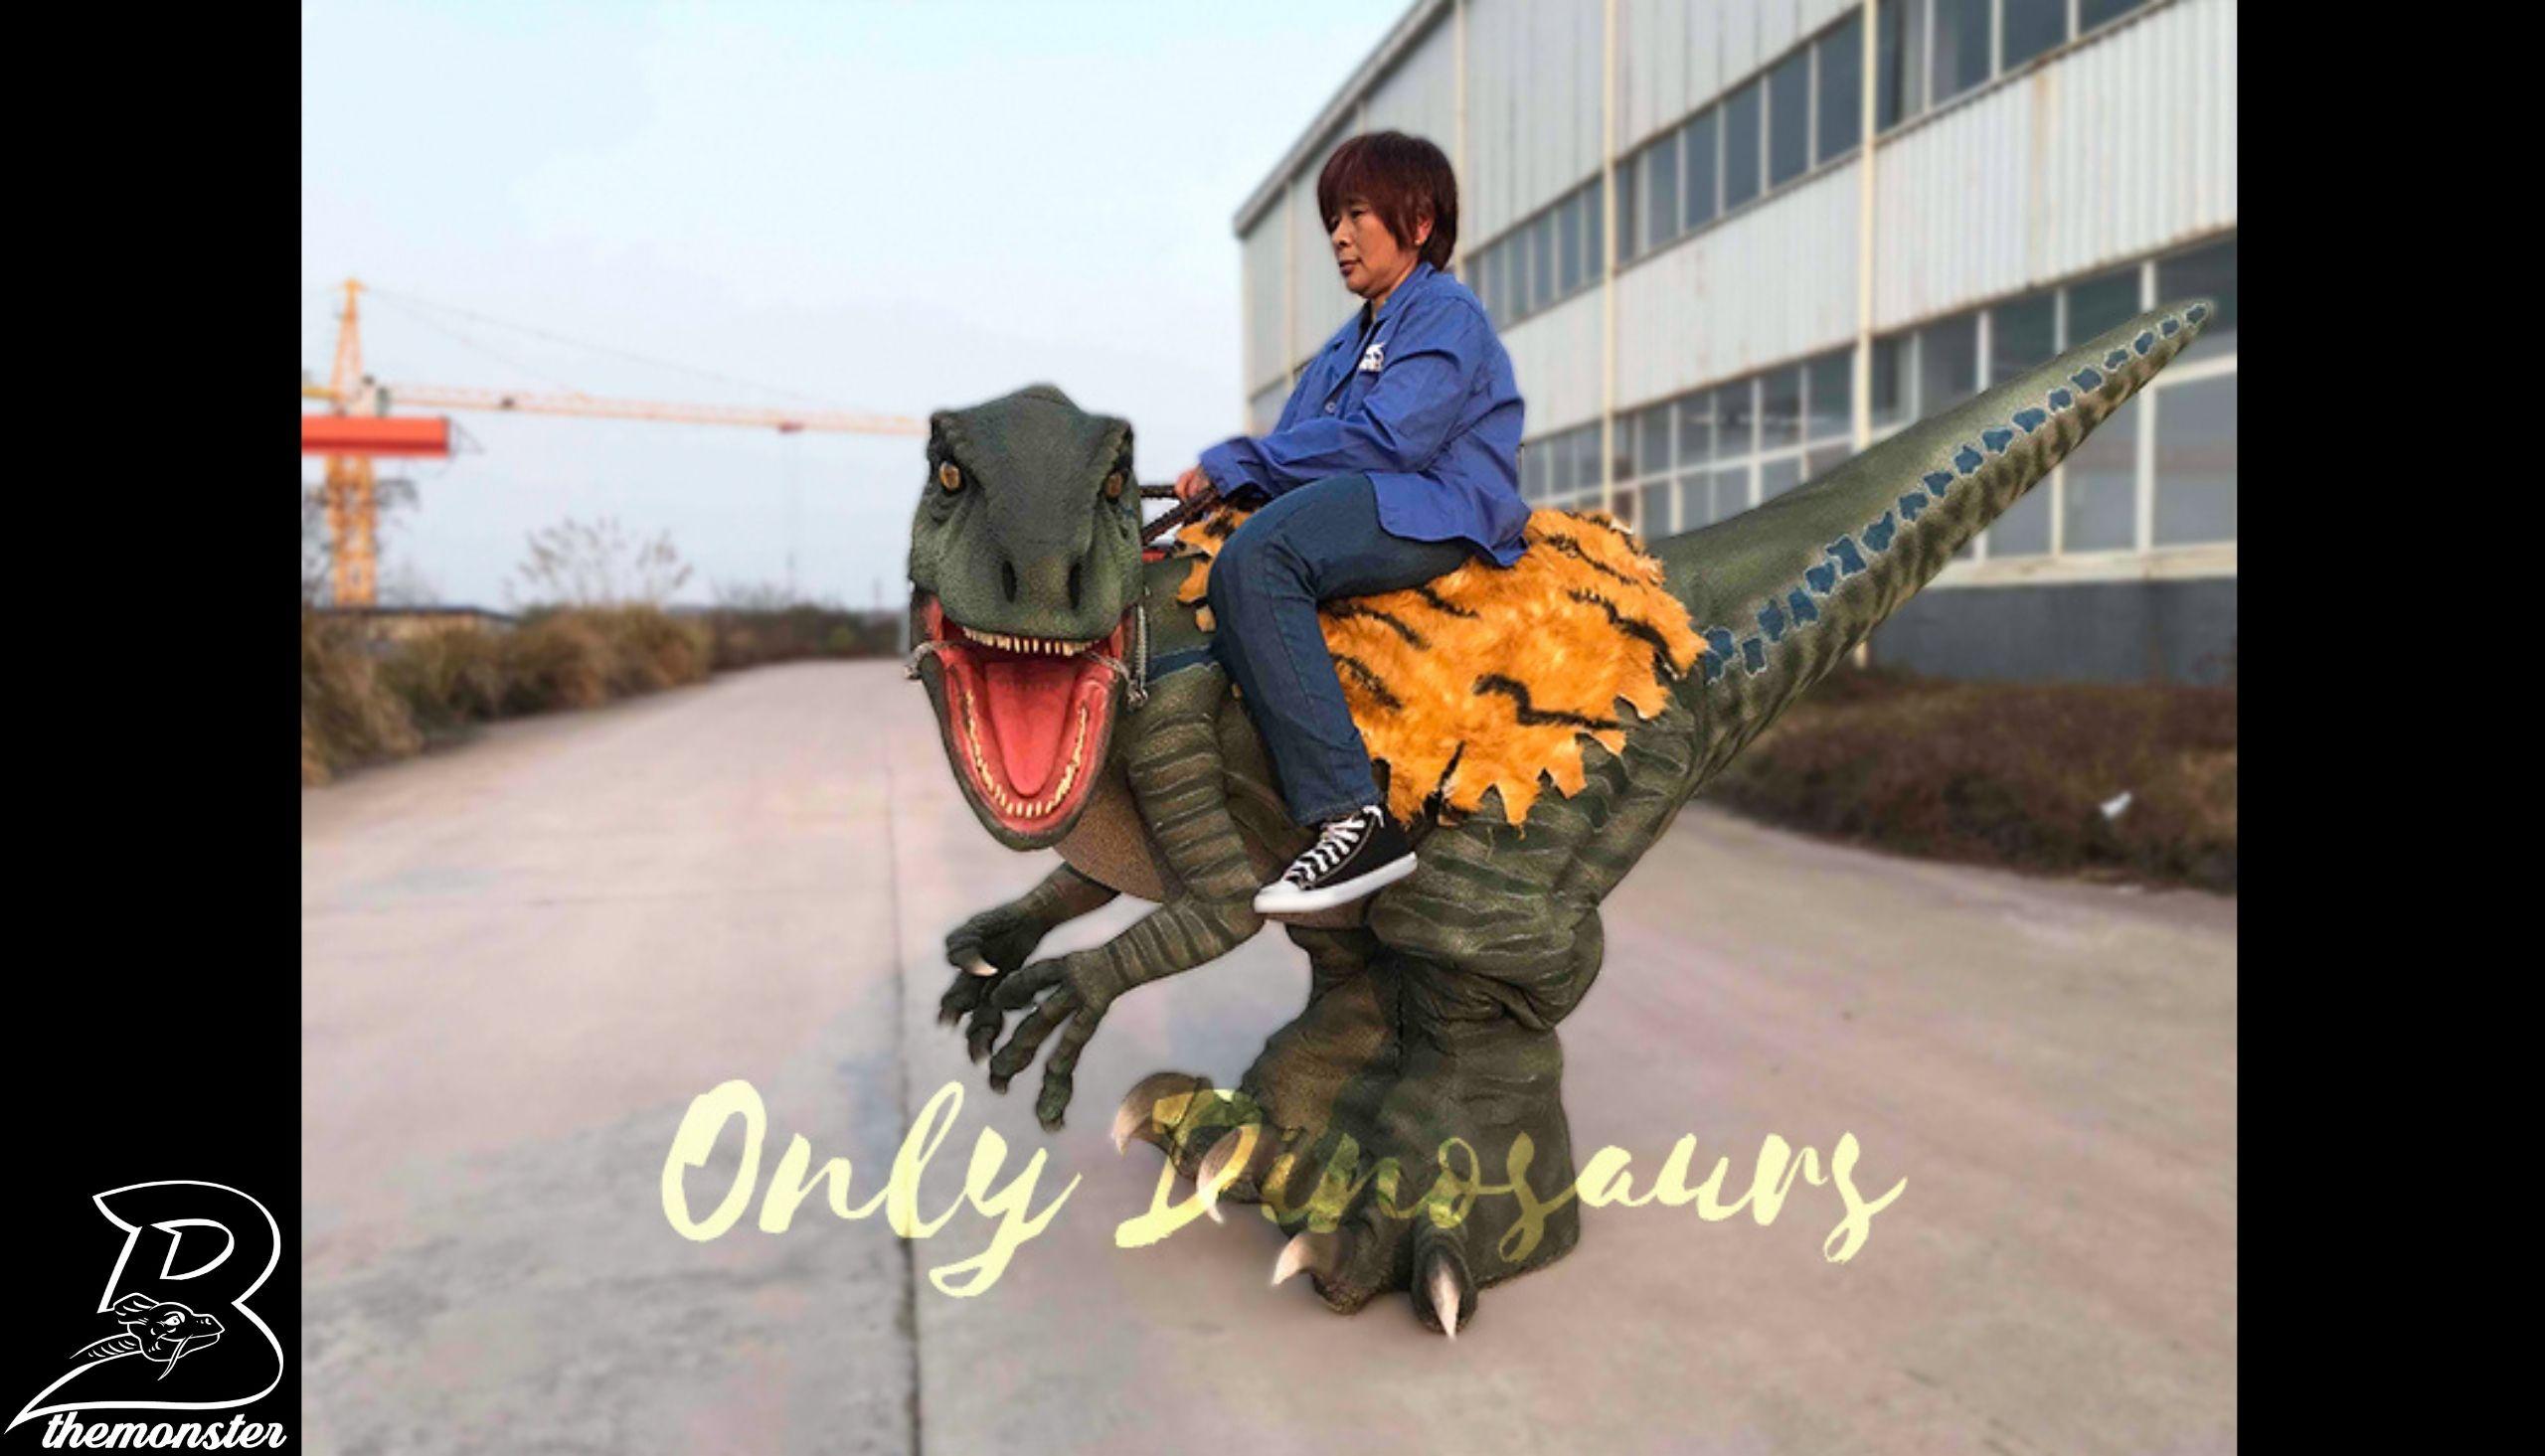 3Authentic Brown Stilt Velociraptor Dinosauro Costume Per Shop Bthemonster.com